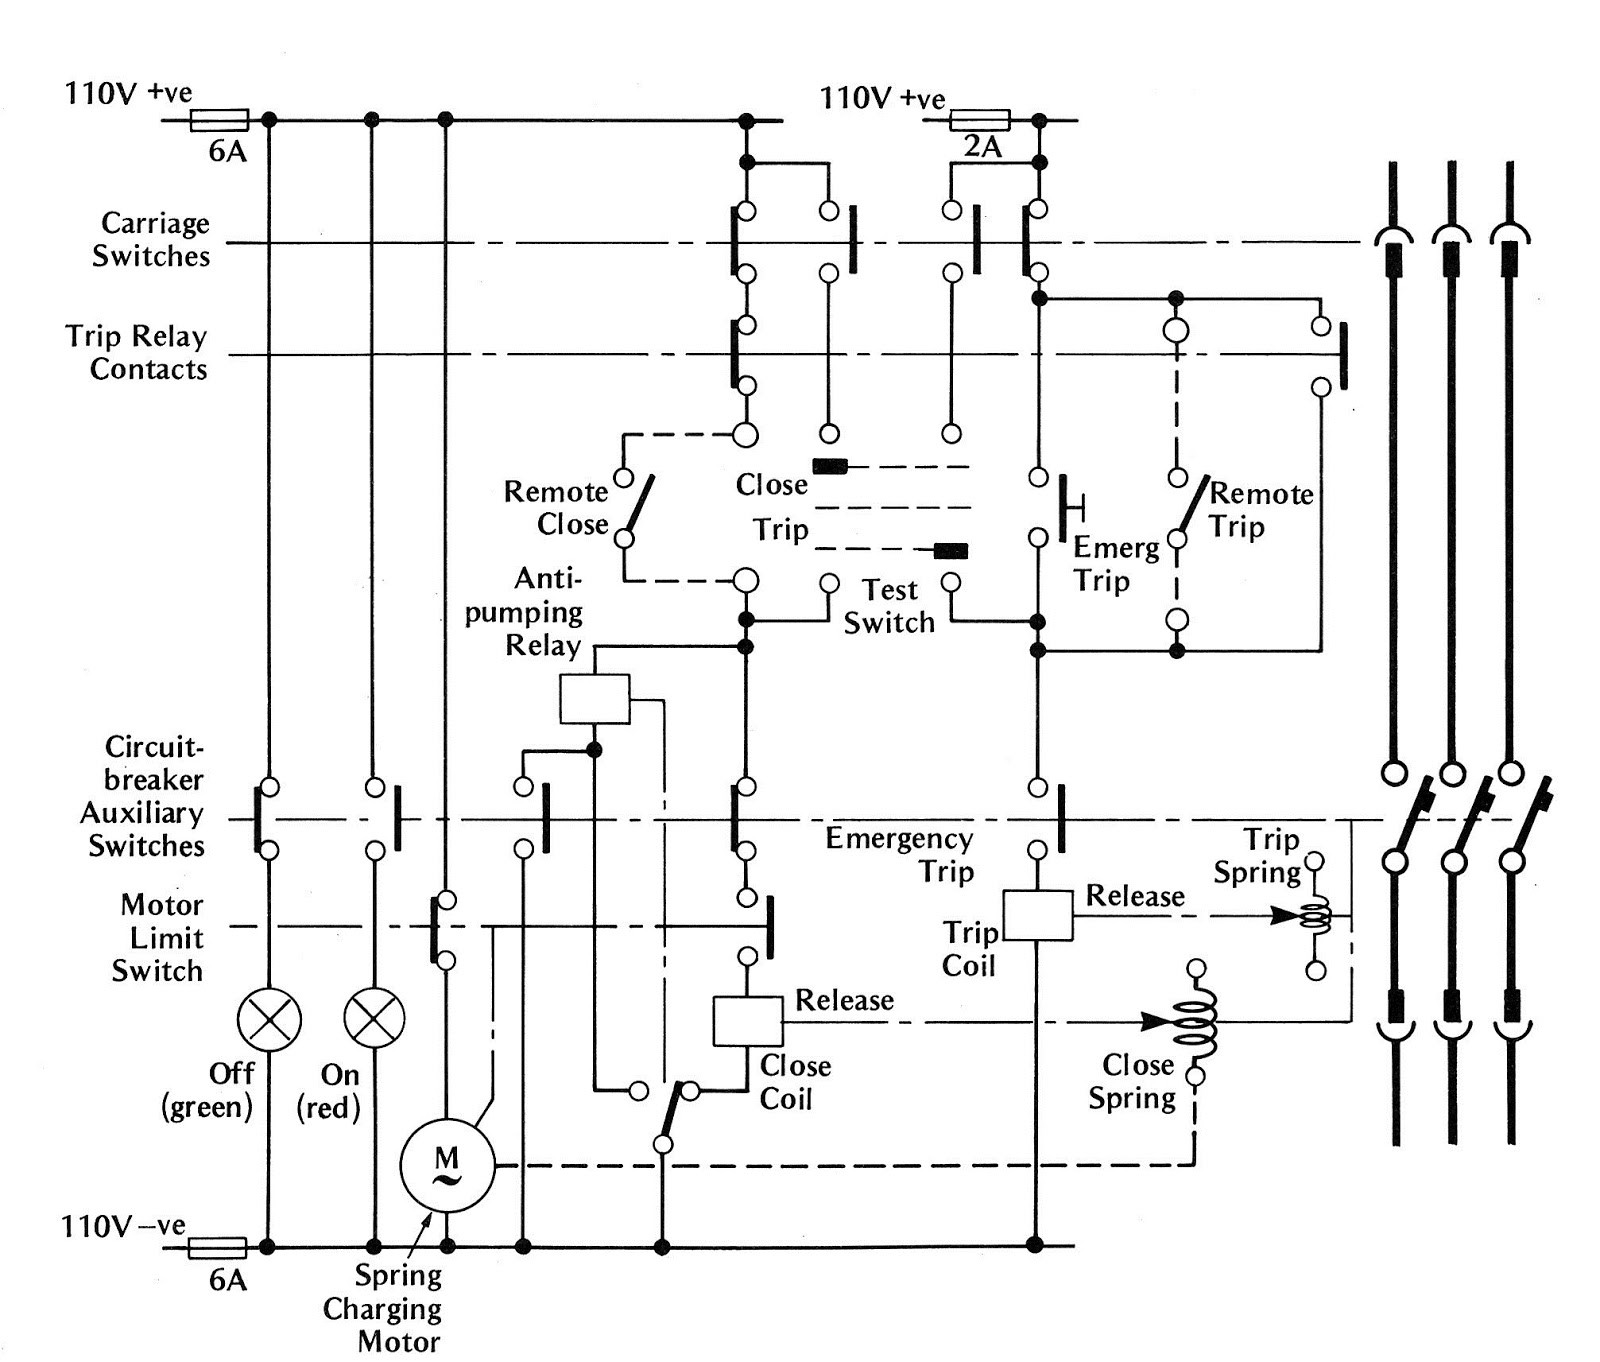 Allen Bradley Motor Control Wiring Diagrams Best Square D Motor Starter Wiring Diagram Gallery Everything You Of Allen Bradley Motor Control Wiring Diagrams